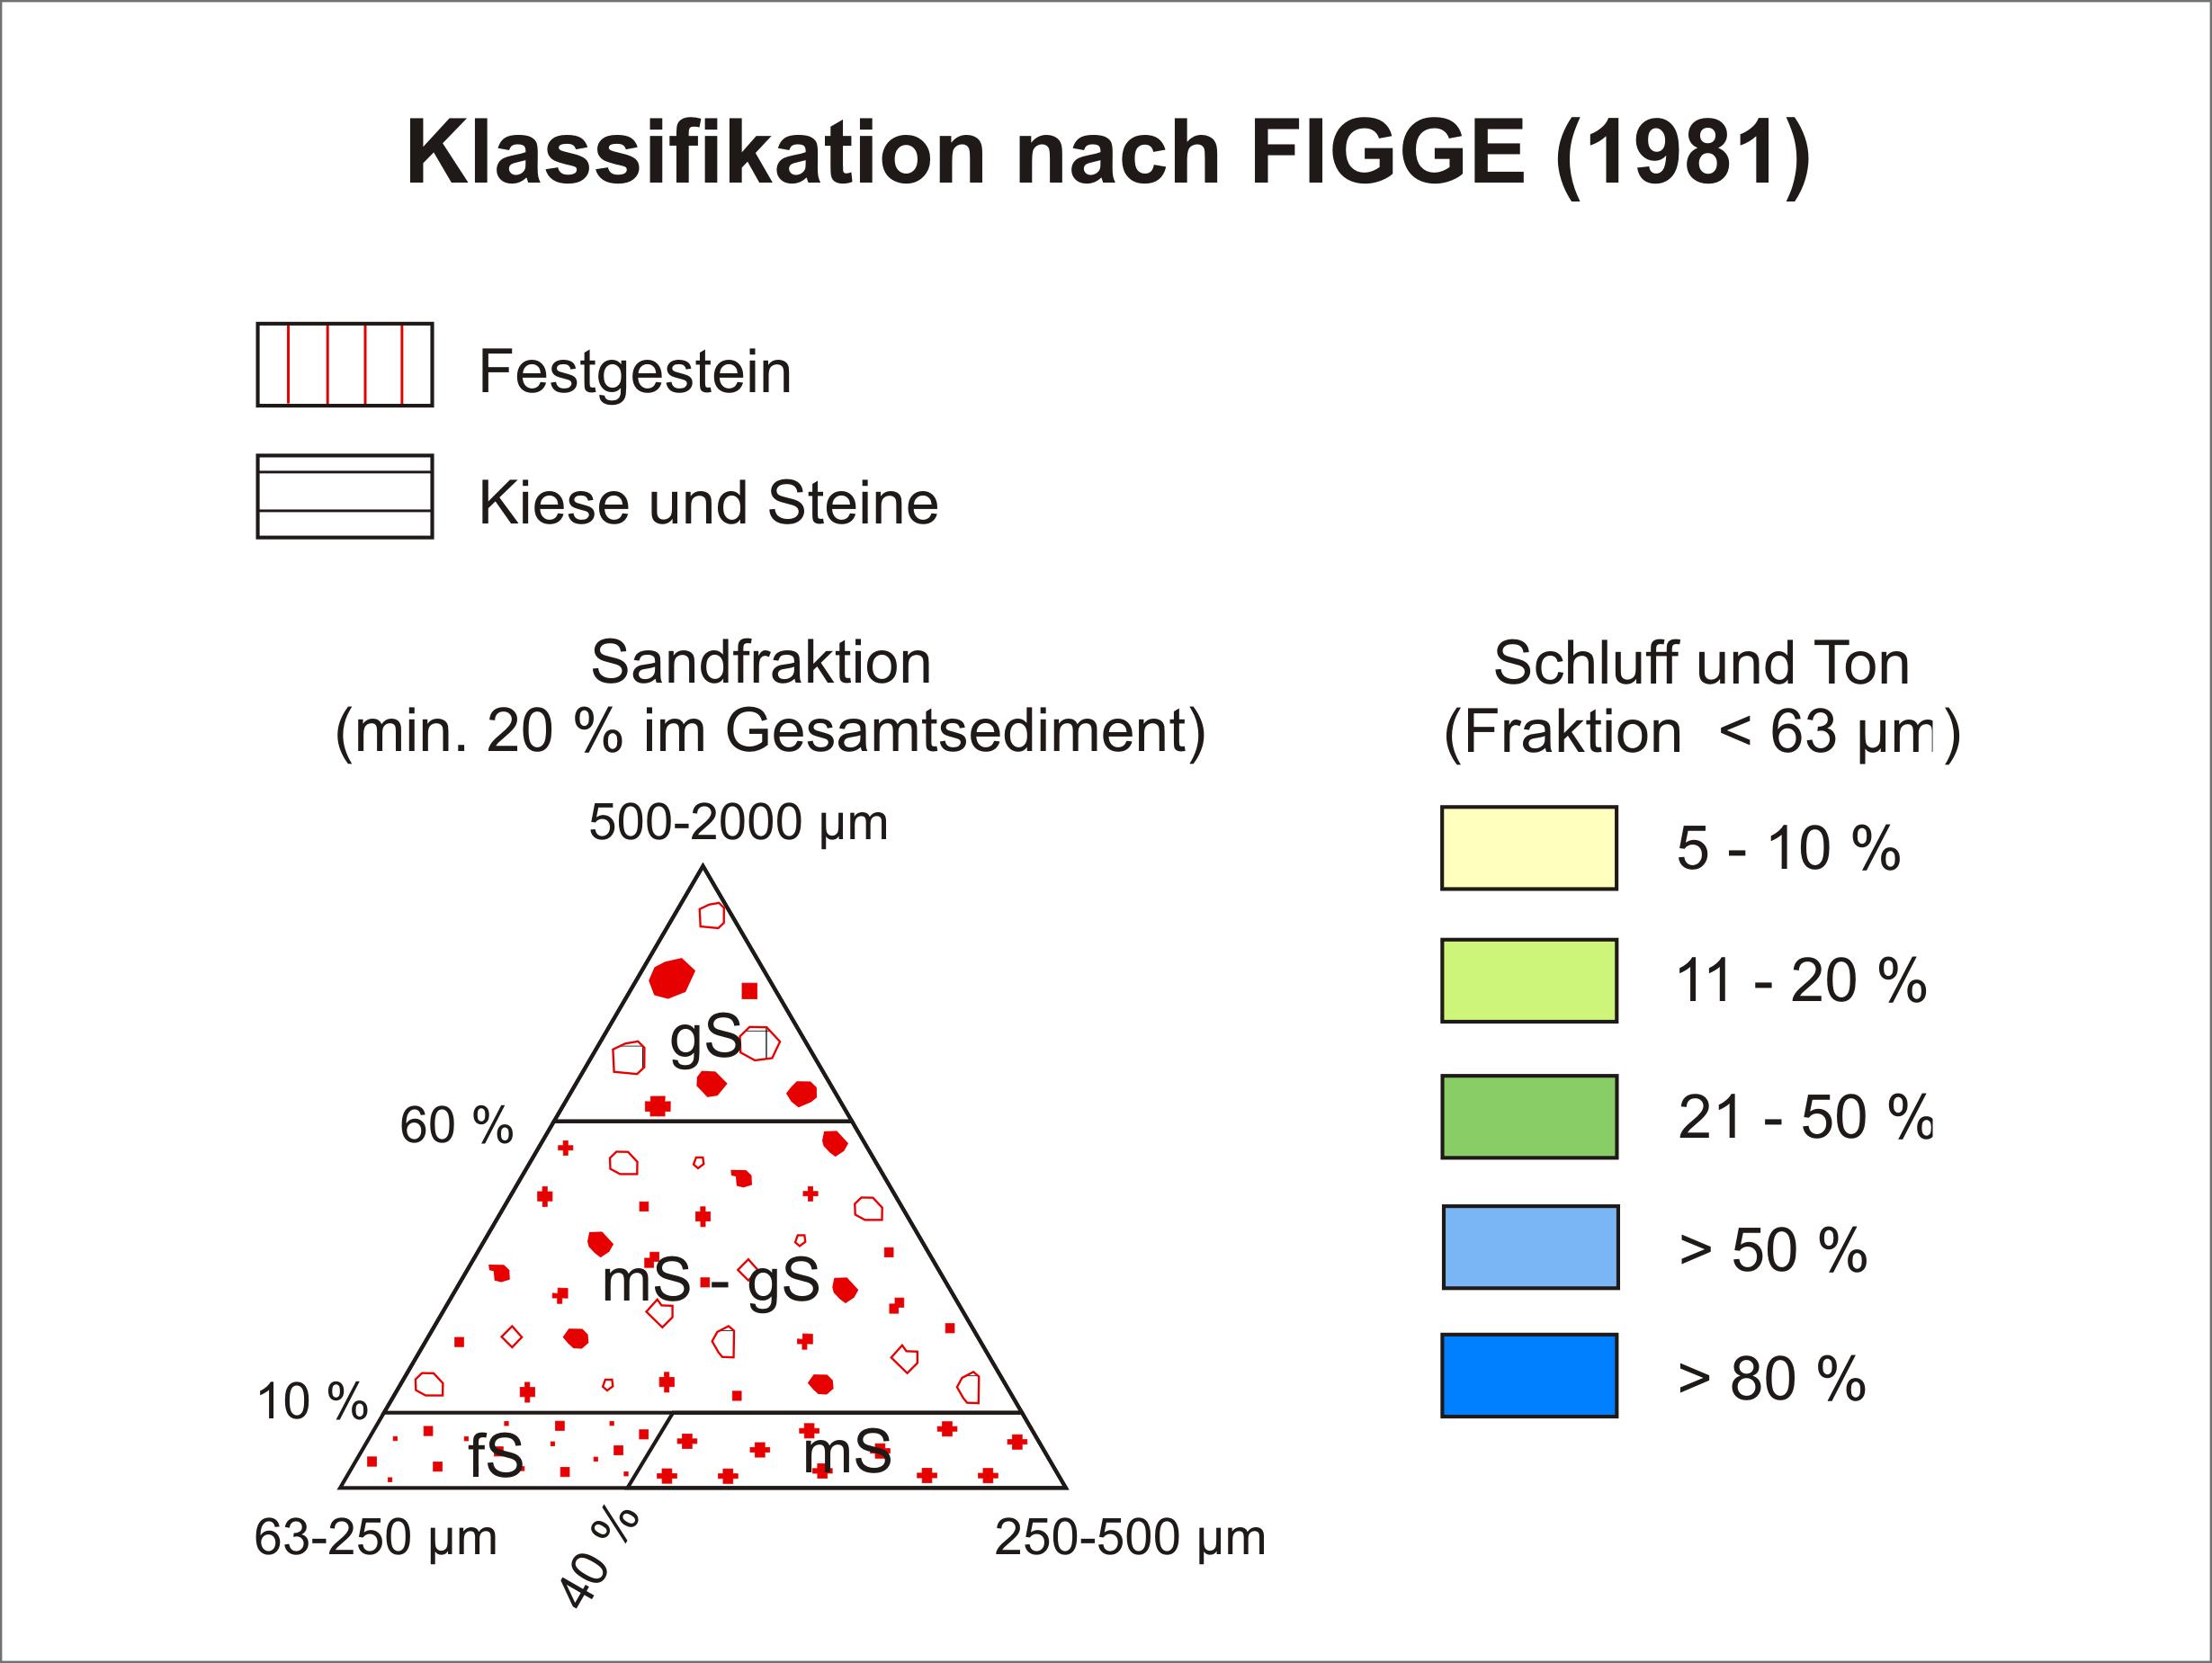 Figge_Klassifikation_fürThemenreise.png